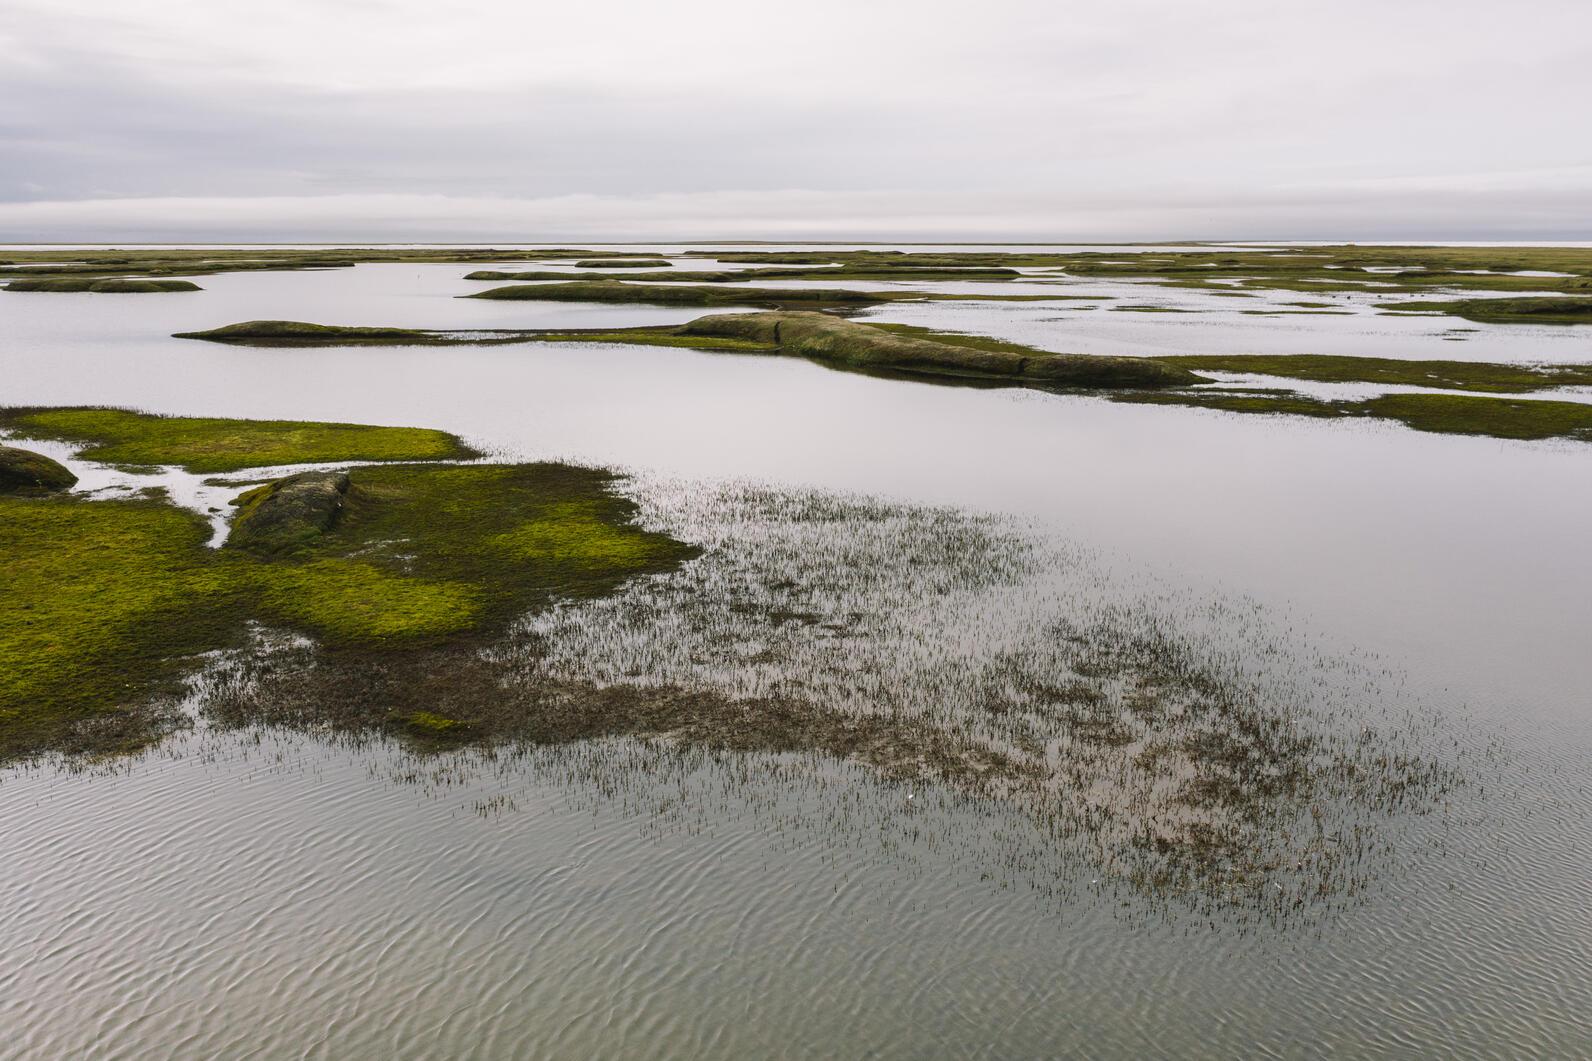 Teshekpuk Lake Wetlands in Alaska's Western Arctic.